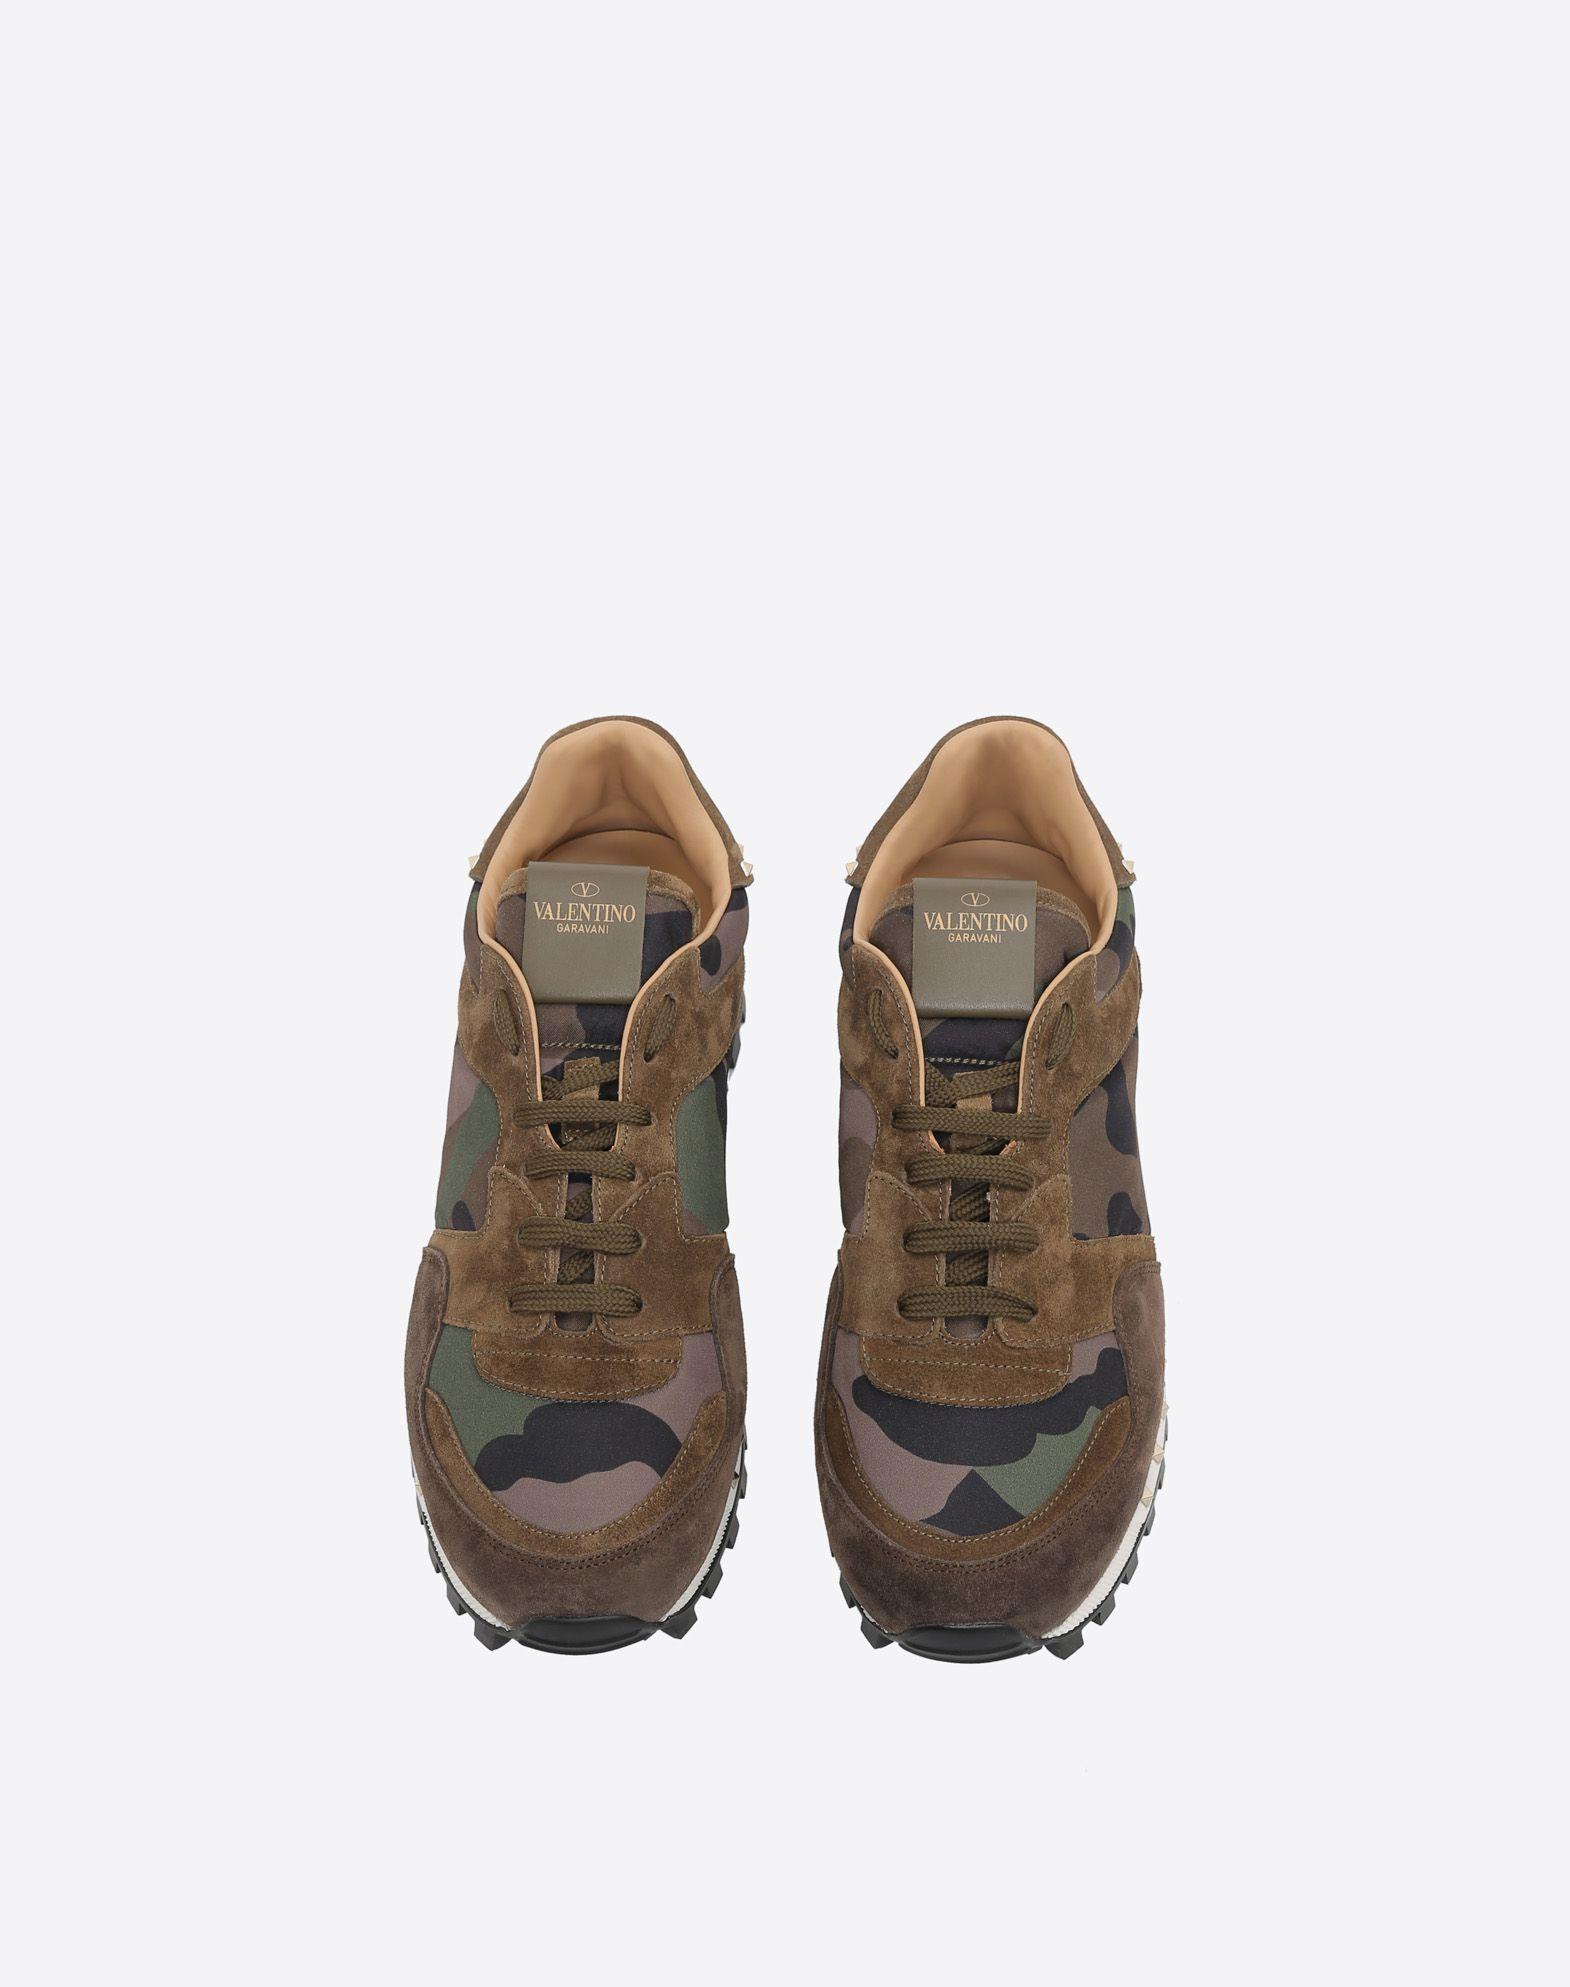 VALENTINO GARAVANI UOMO Camouflage Sneaker LOW-TOP SNEAKERS U e